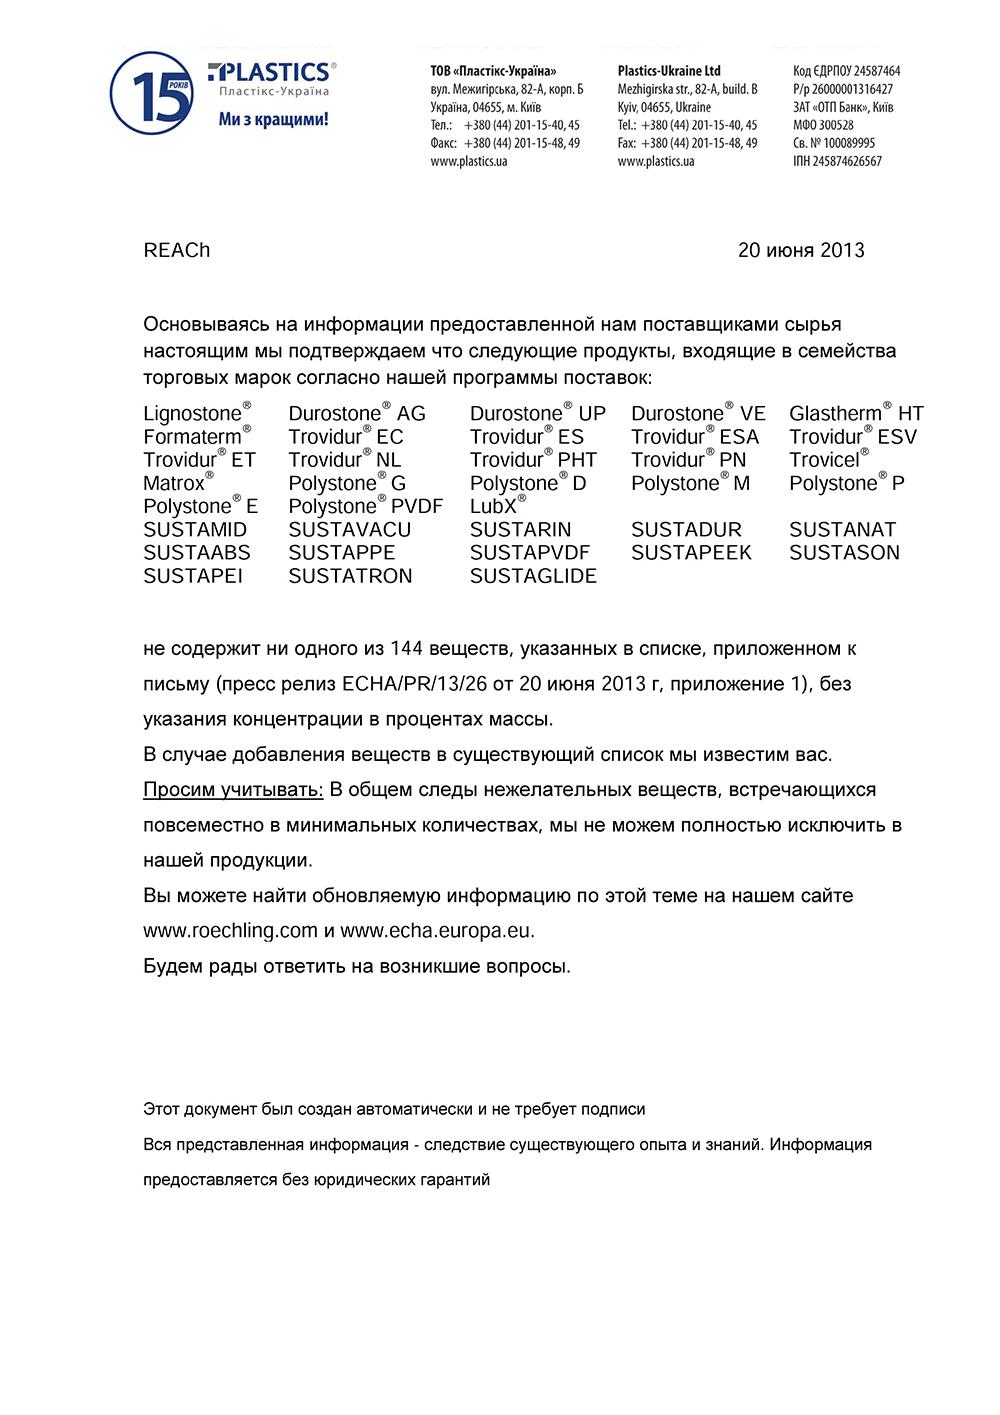 sertifikat-kachestva-plastics-yktg-com